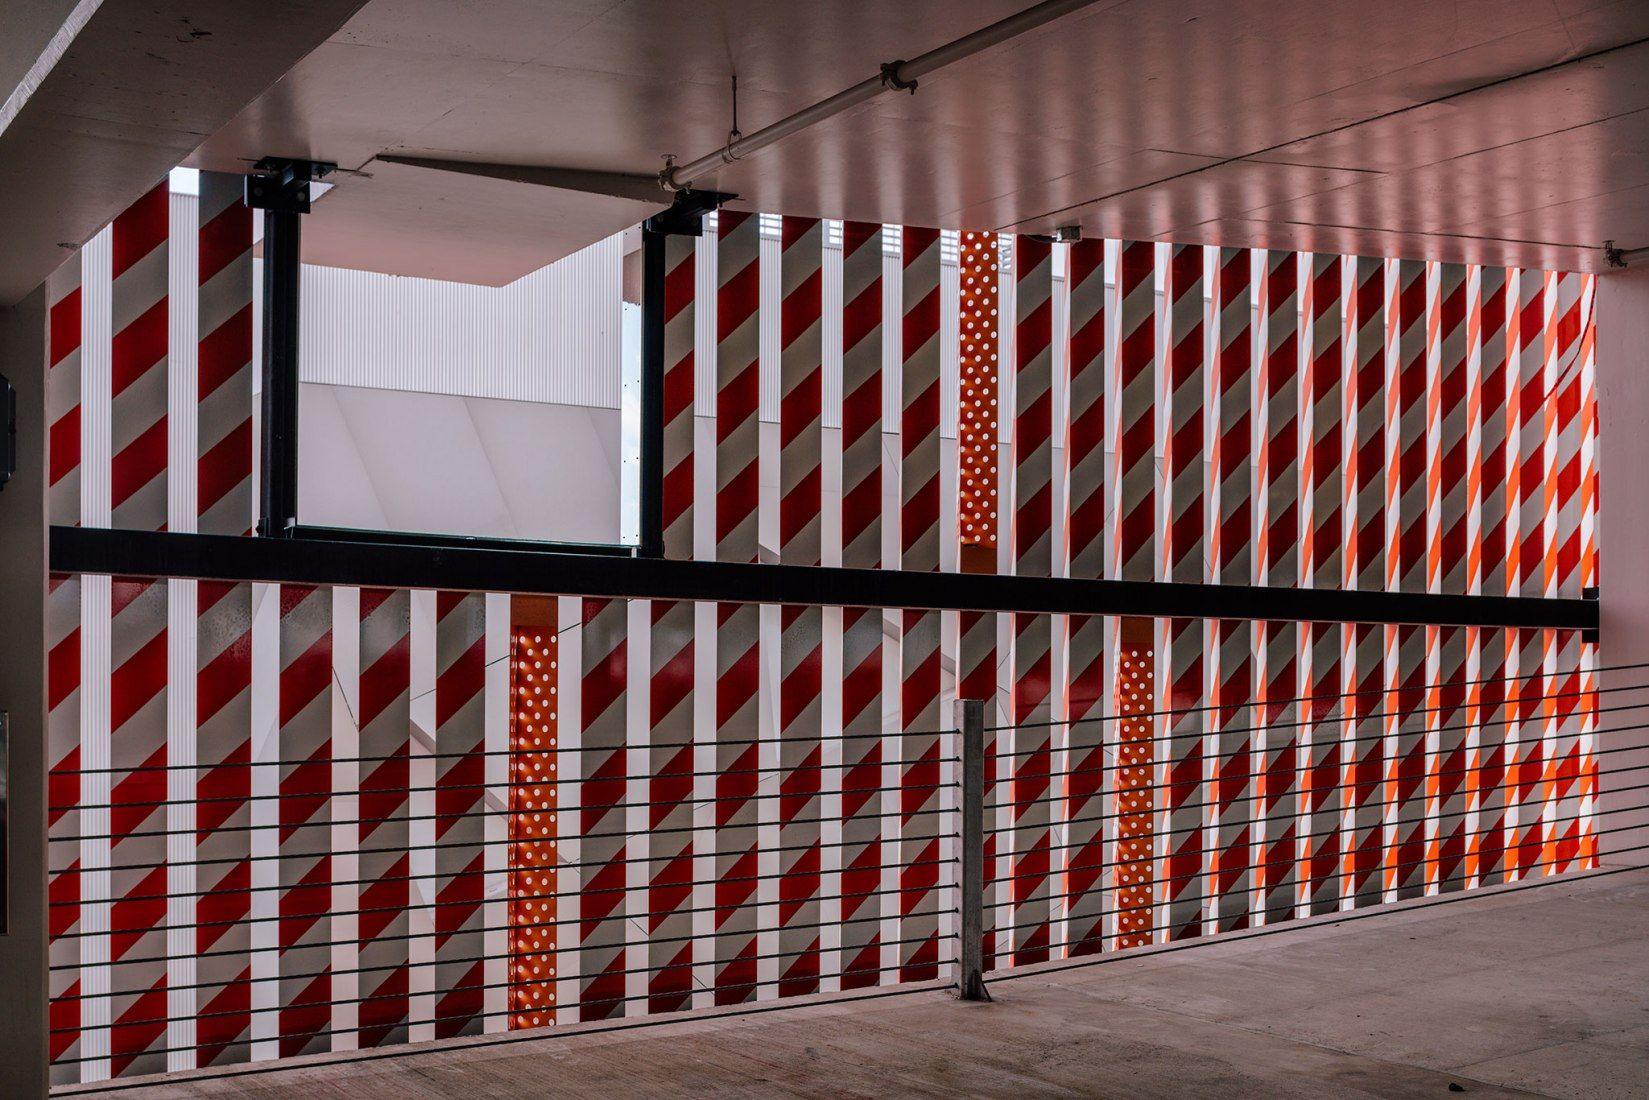 Inside View Barricades By K R Miami Museum Garage Photograph By Miguel De Guzman Imagen Subliminal Architect Exterior Design Miami Design